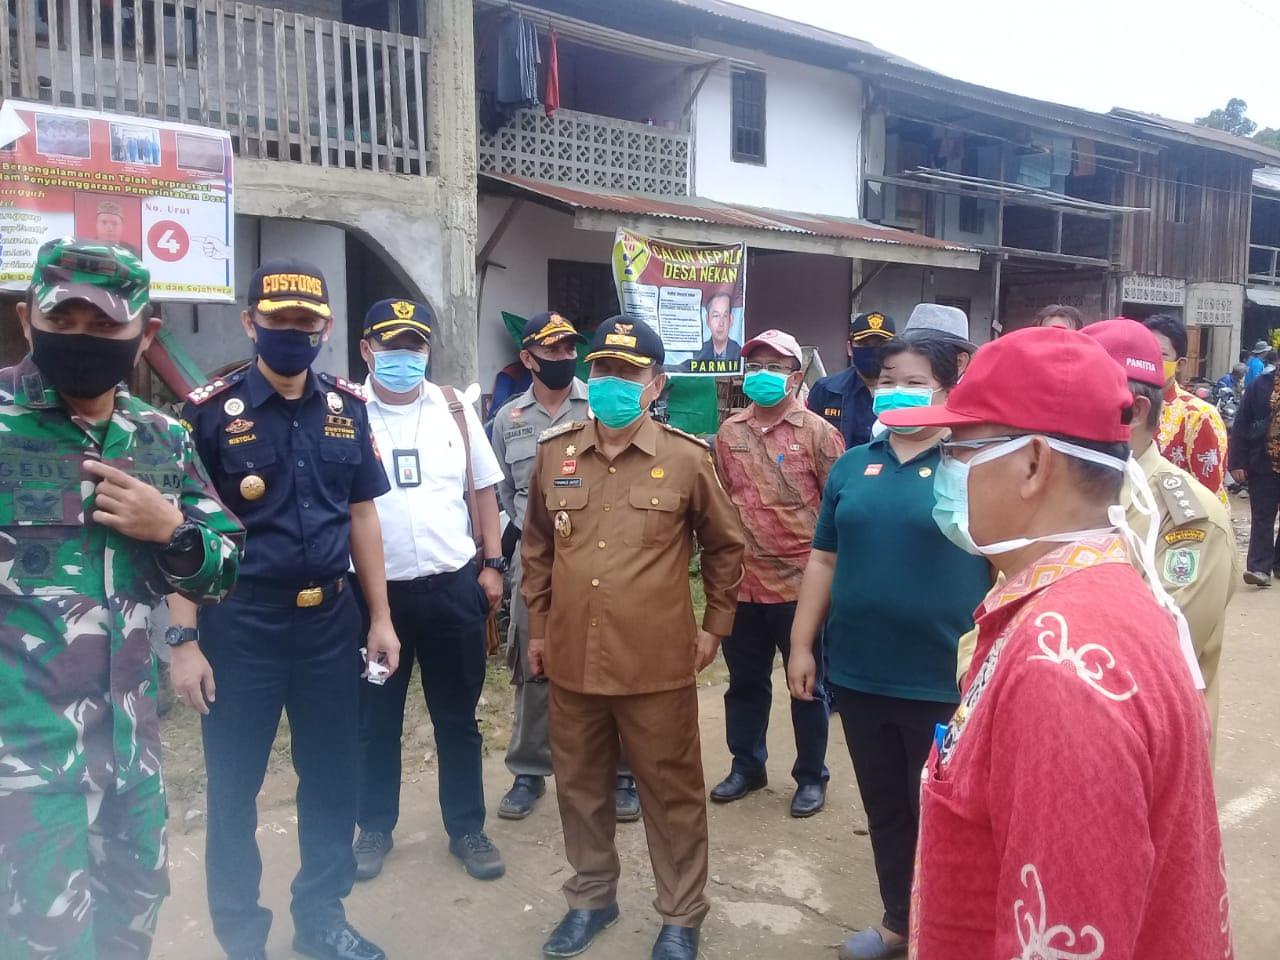 Wakil Bupati Sanggau dan Forkompimda serta Kepala OPD Tinjau langsung lokasi Banjir Bandang